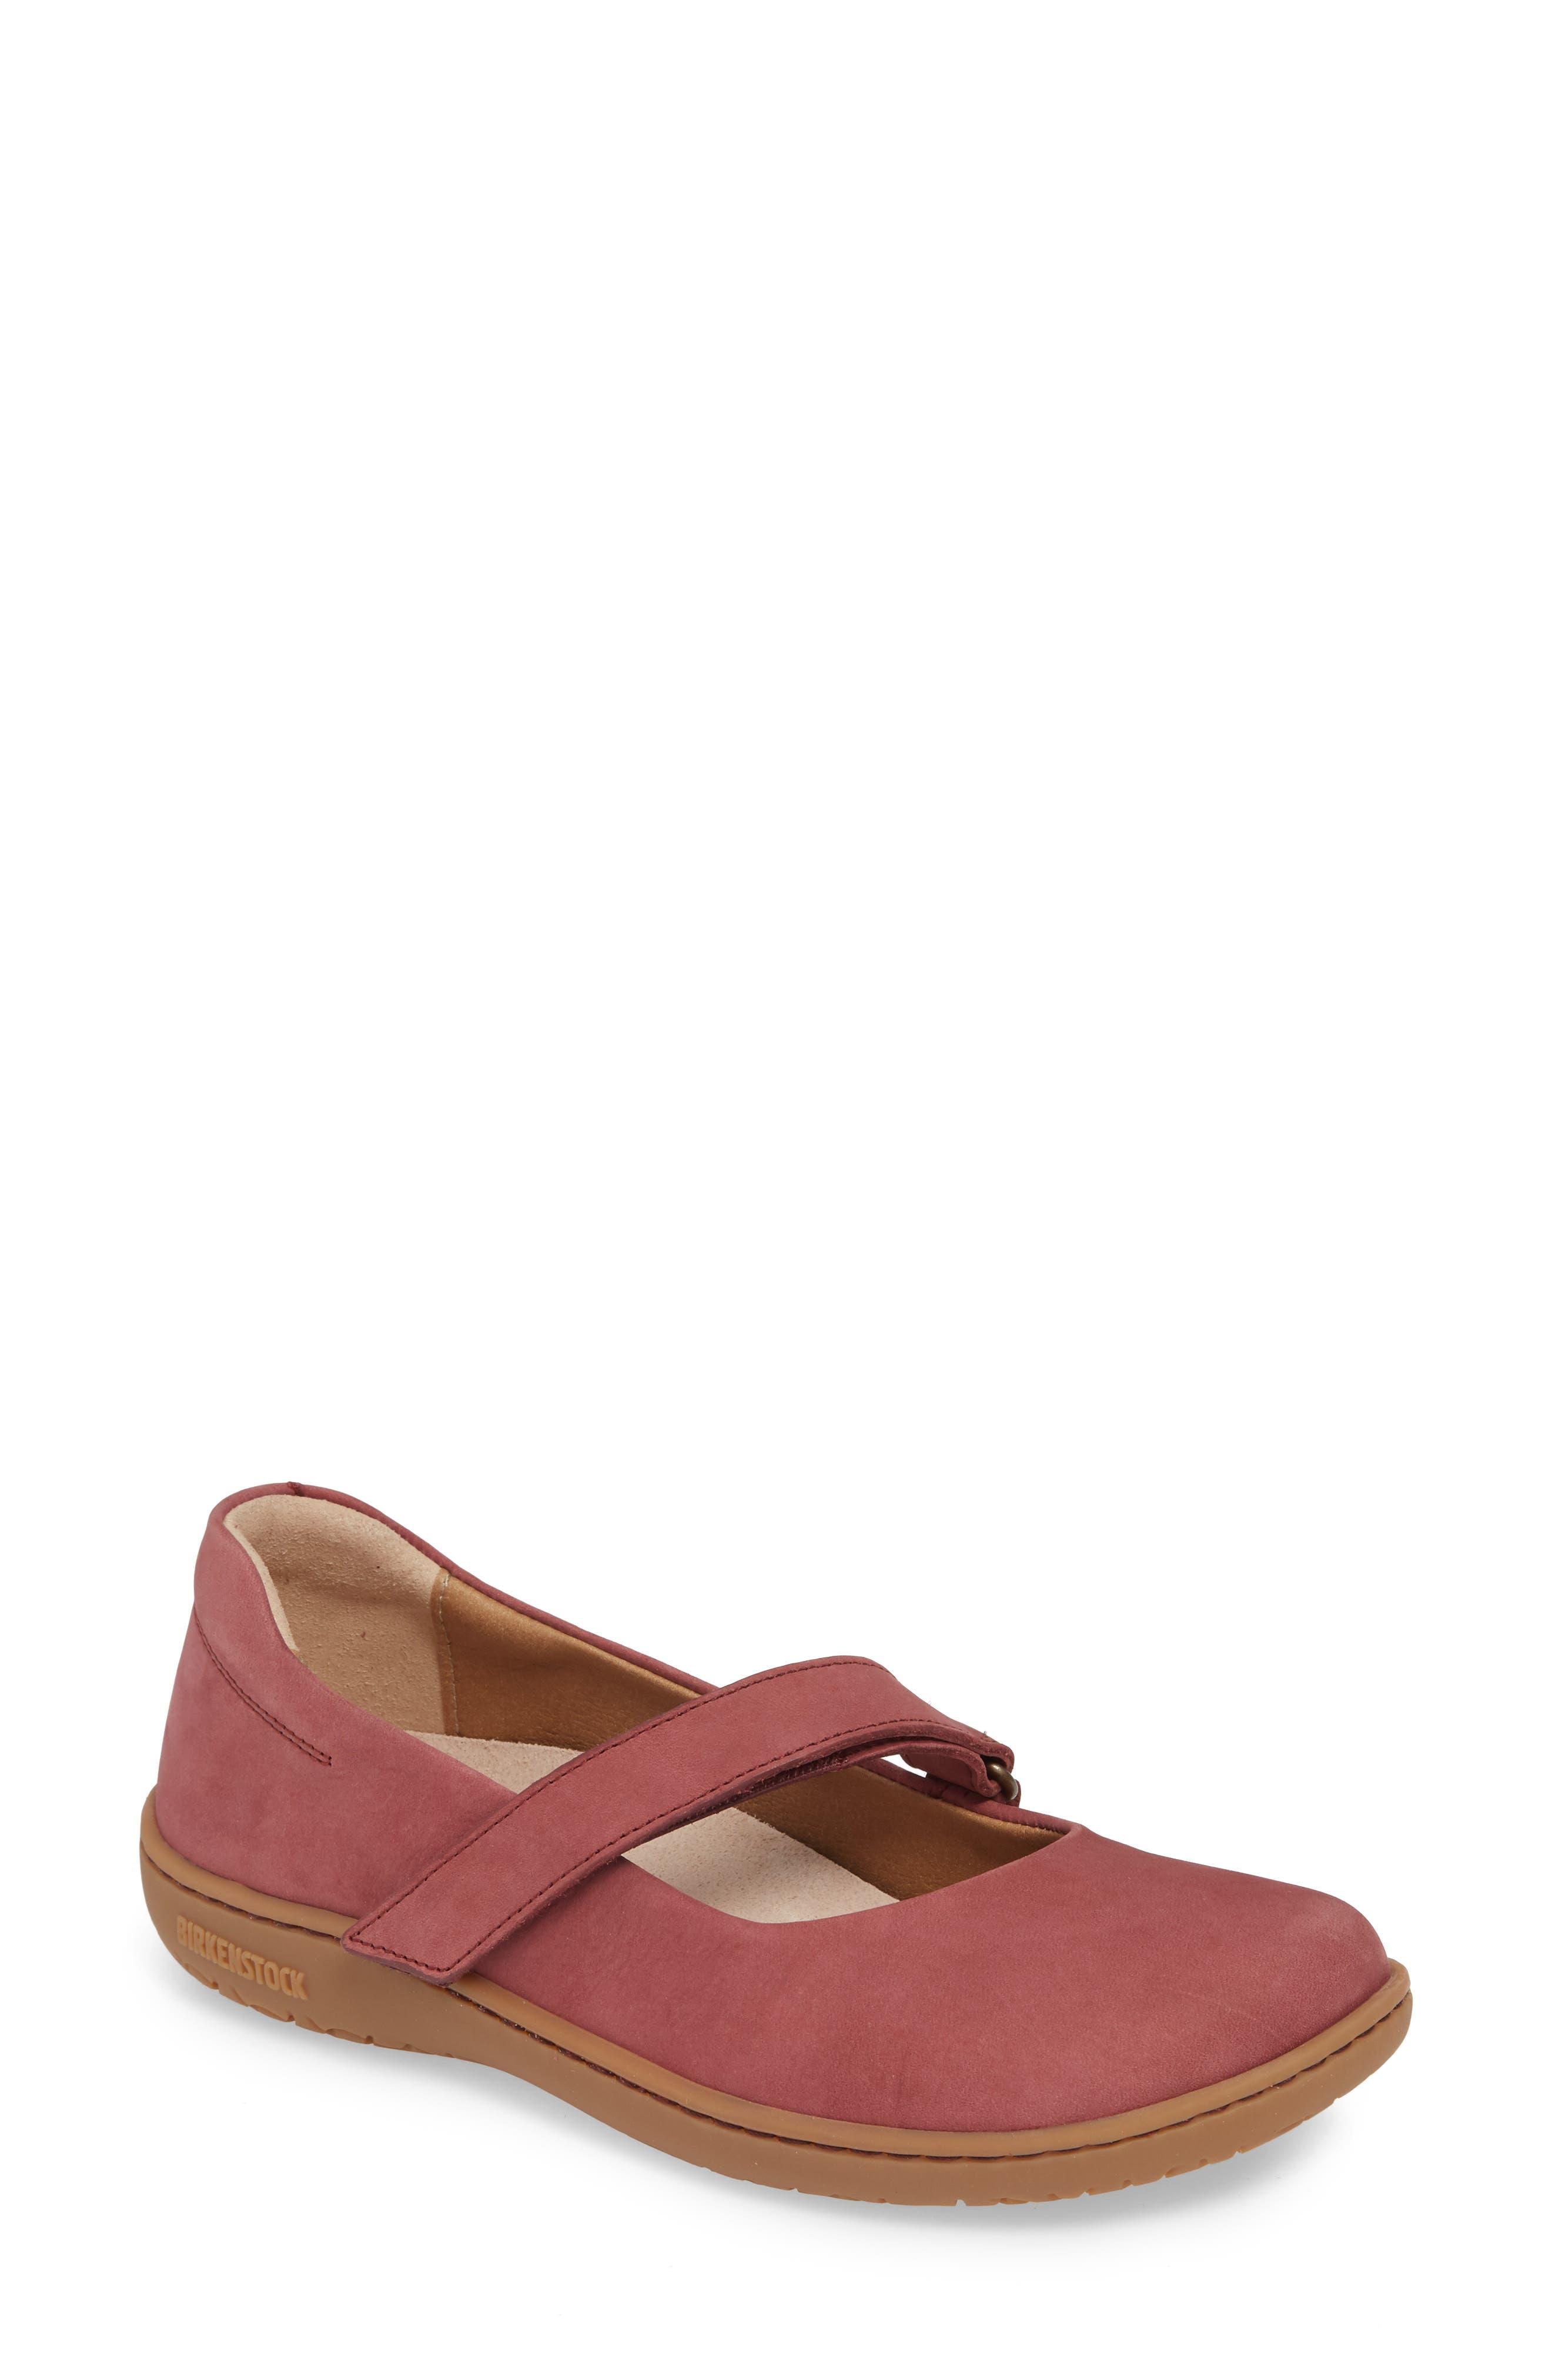 Birkenstock Lora Flat - Red